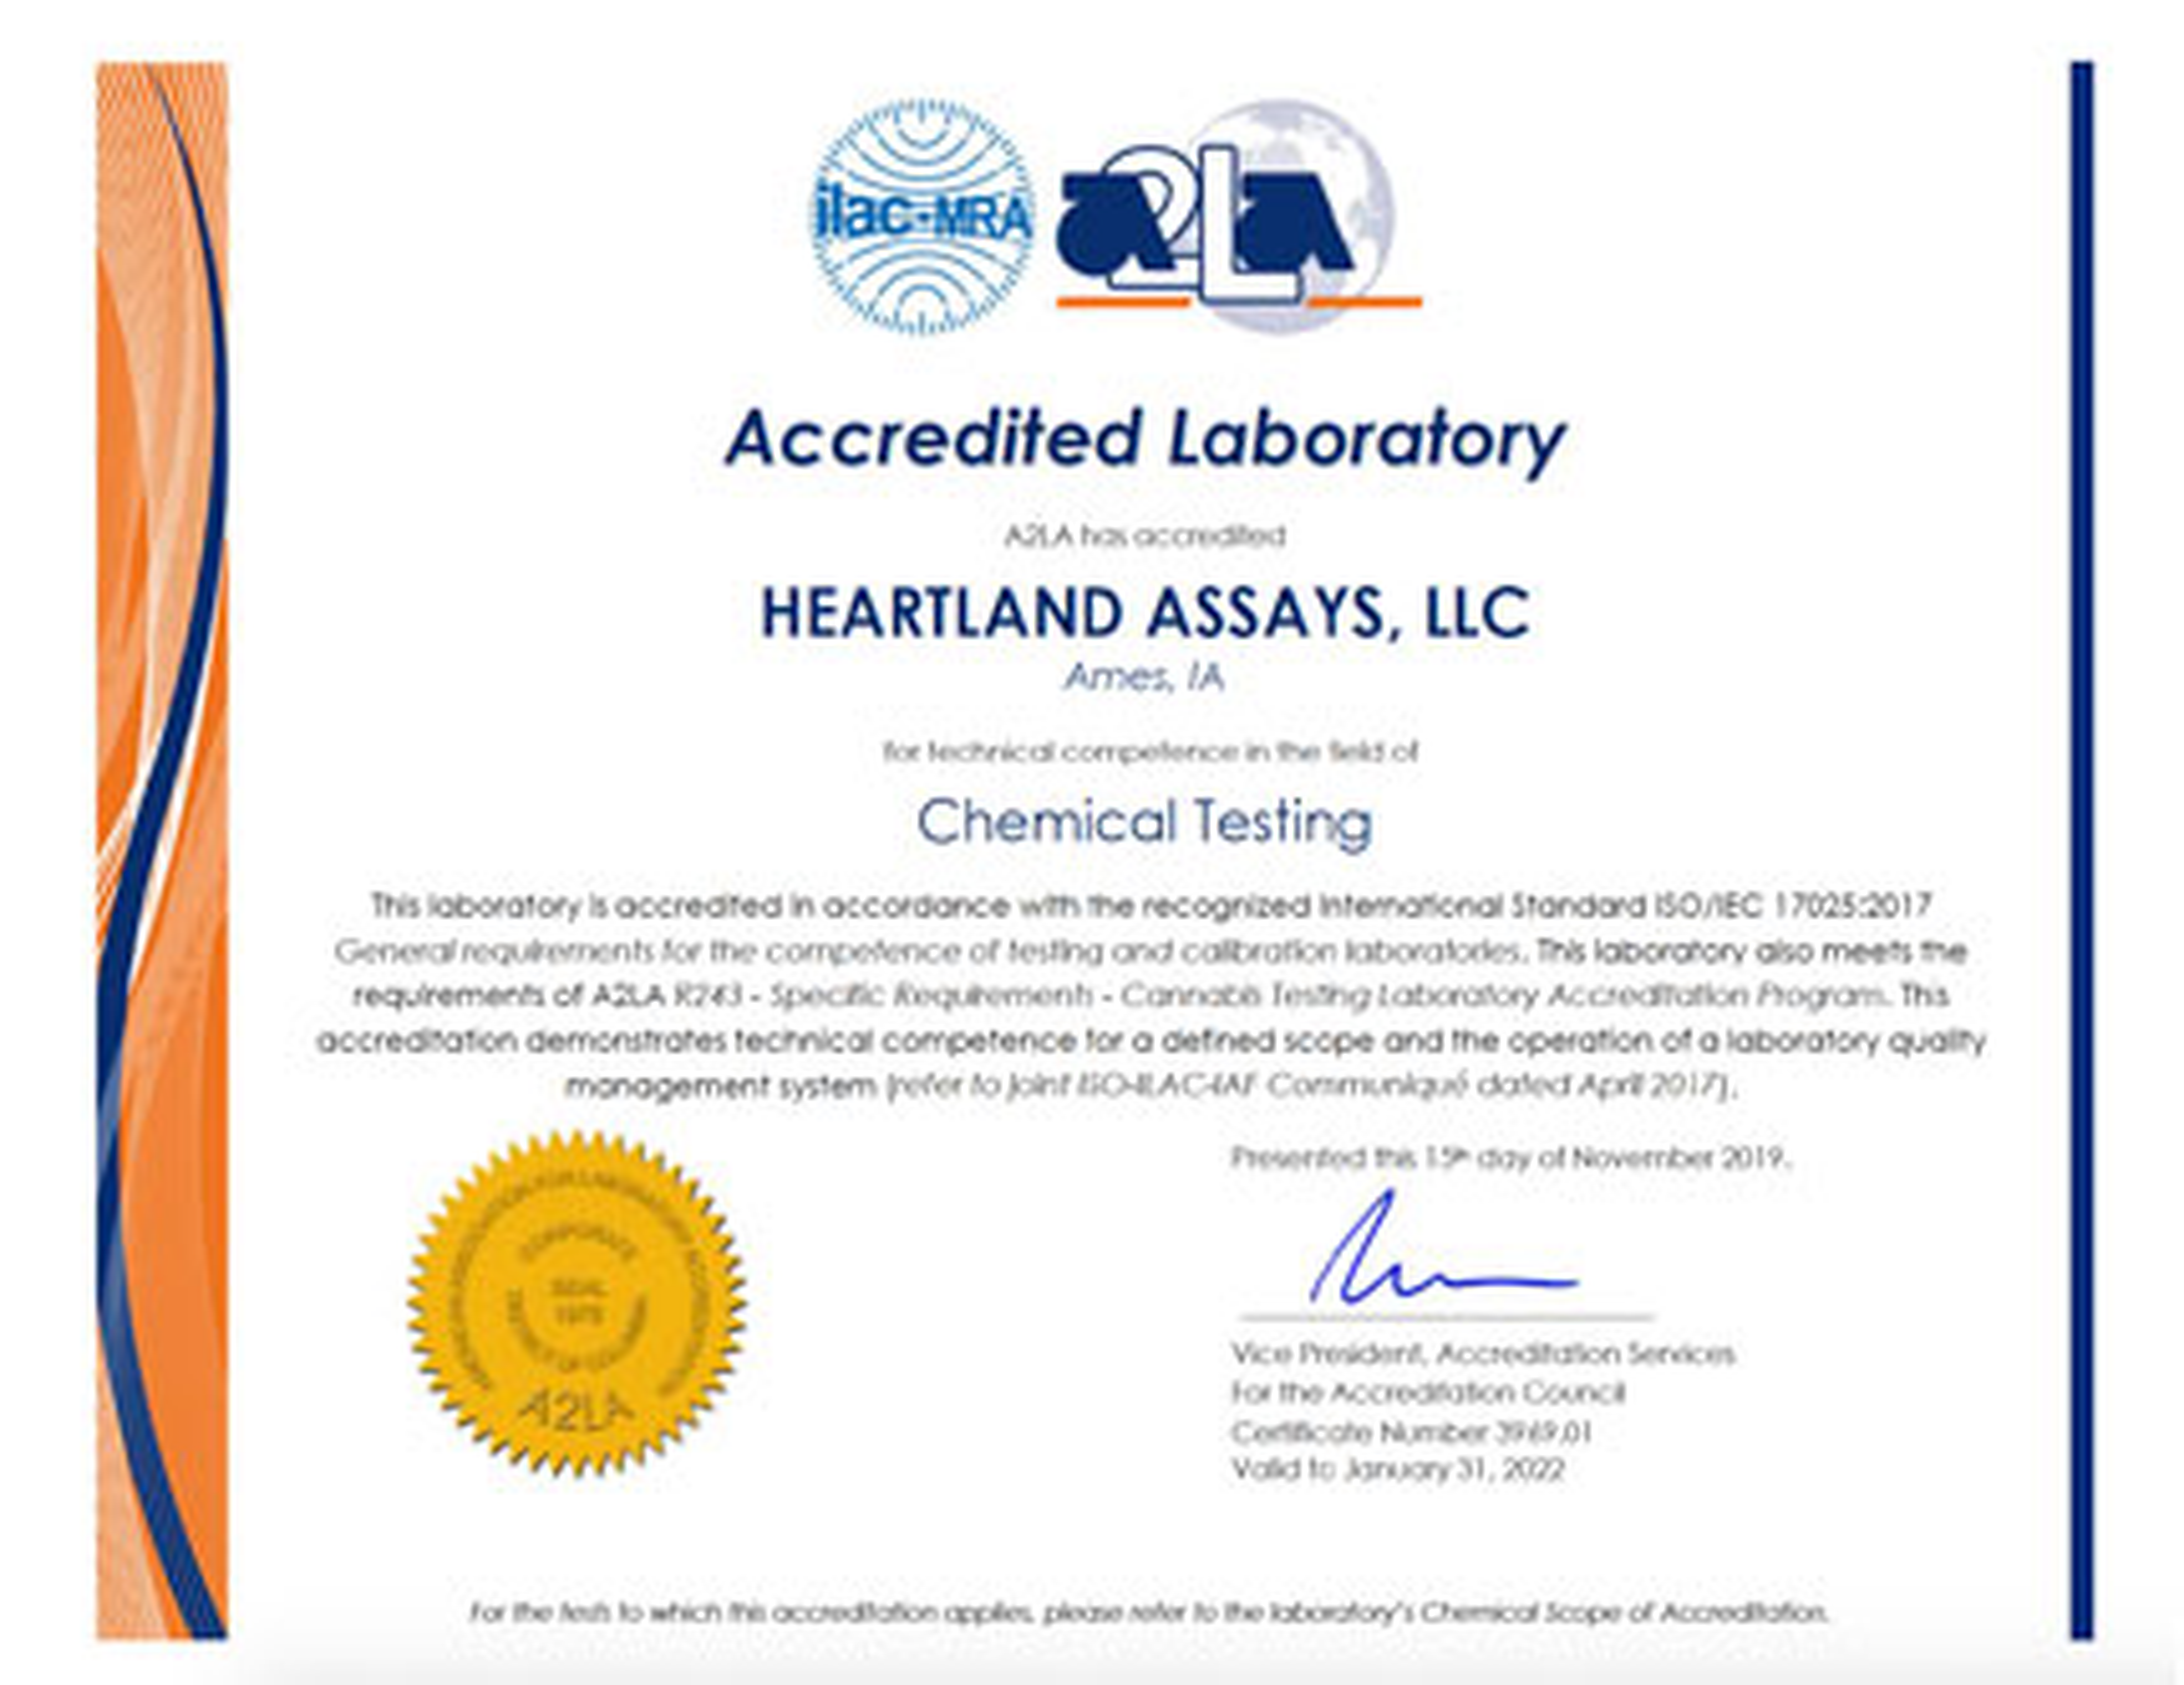 Isoiec 170252005 Accredited Testing Heartland Assays